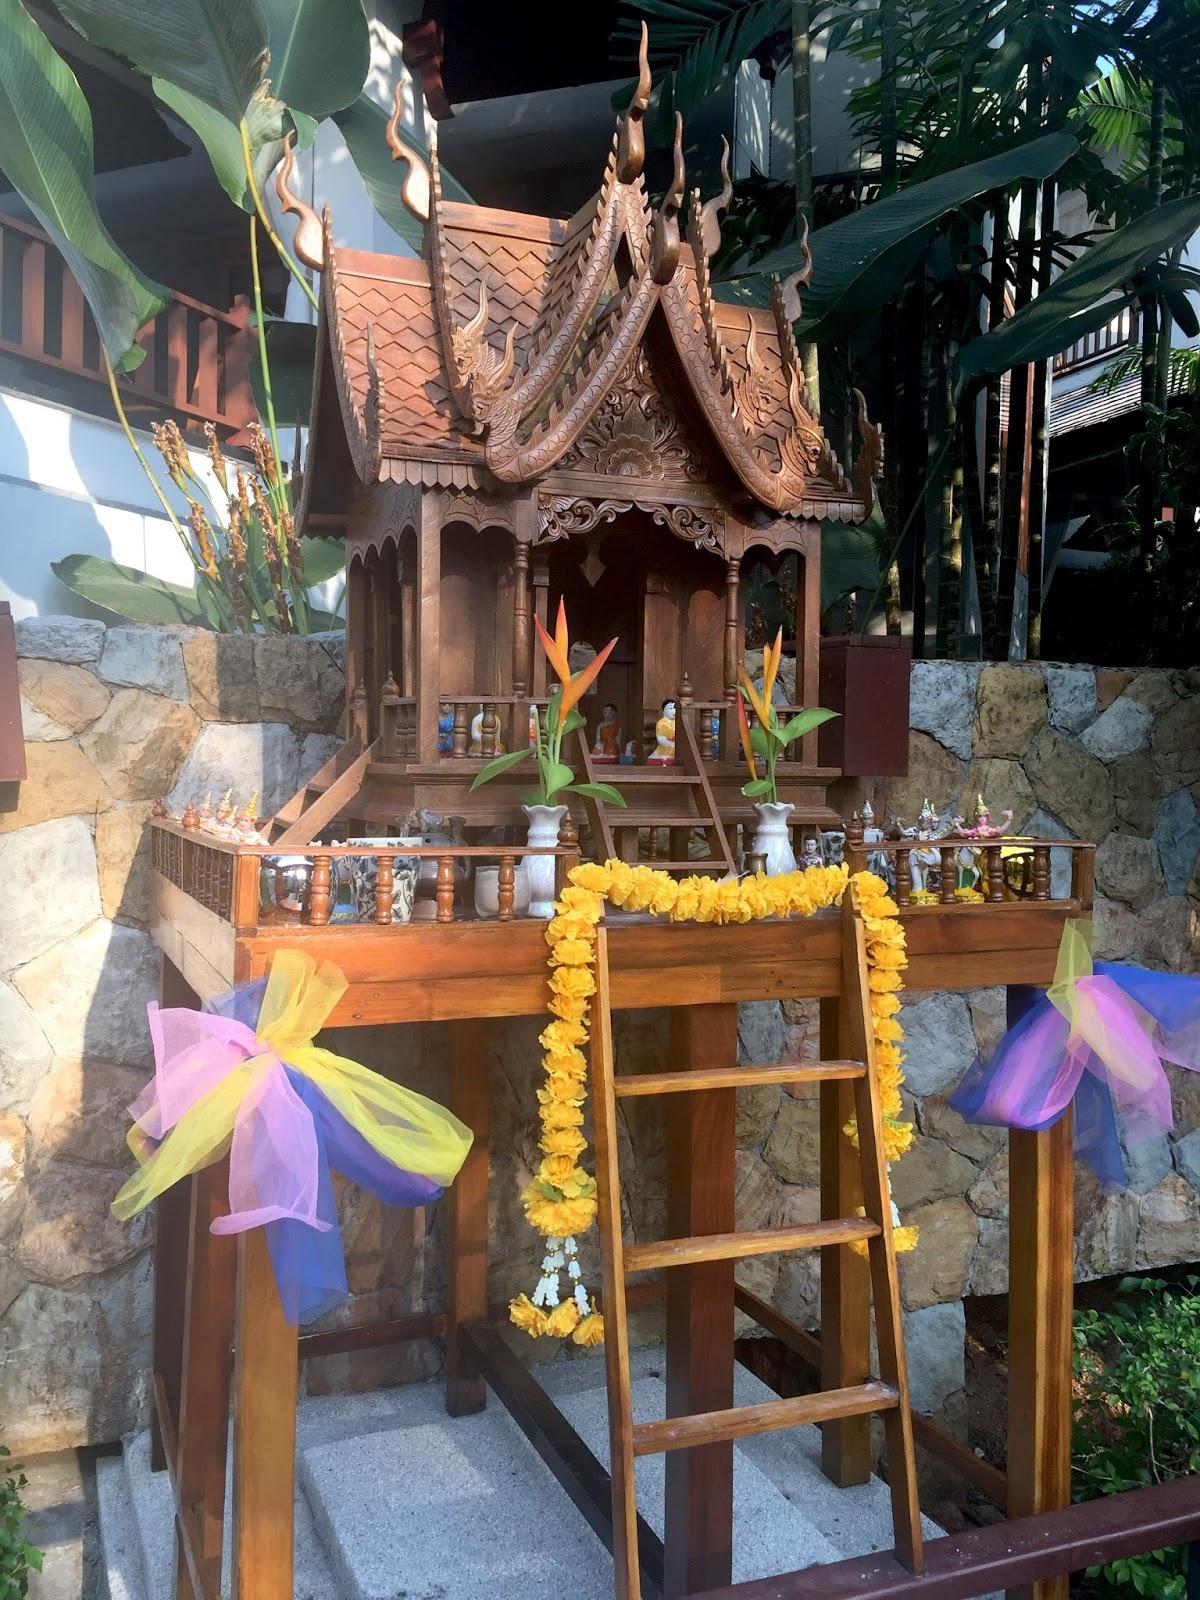 Krabi, Dovolená krabi, nakamanda resort & spa, nakamanda, nakamanda review, nakamanda krabi review, hotely krabi, hotel krabi, bangkok blog, blog cestování, blog o cestování, hotel thajsko, ubytování thajsko, thajsko, thajsko na vlastní pěst, ubytování krabi, resort krabi, nejlepší pláž krabi, best hotel krabi, slh thailand, slh krabi, hotel thailand, hotel review thailand, trabel blogger, dovolená thajsko, holiday thailand